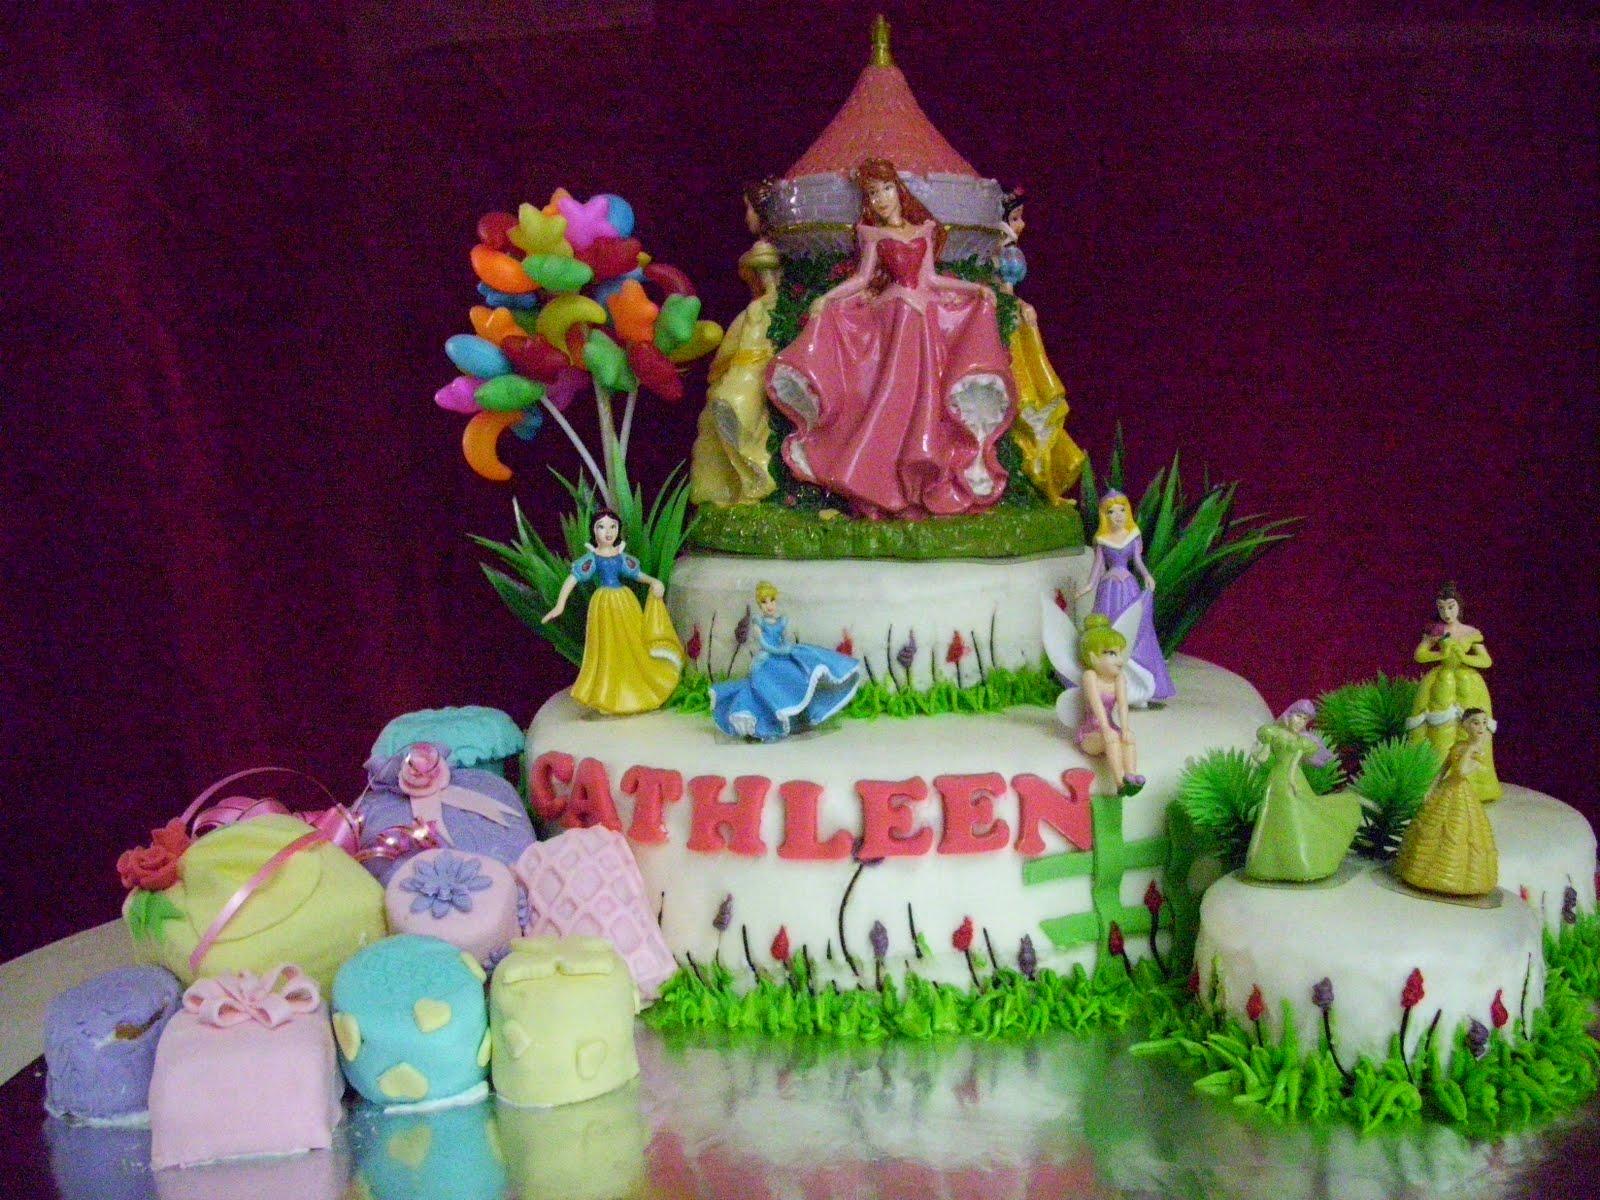 Tasikmalaya Lacocosresto Amp Bakery Kue Ultah Untukcathleen